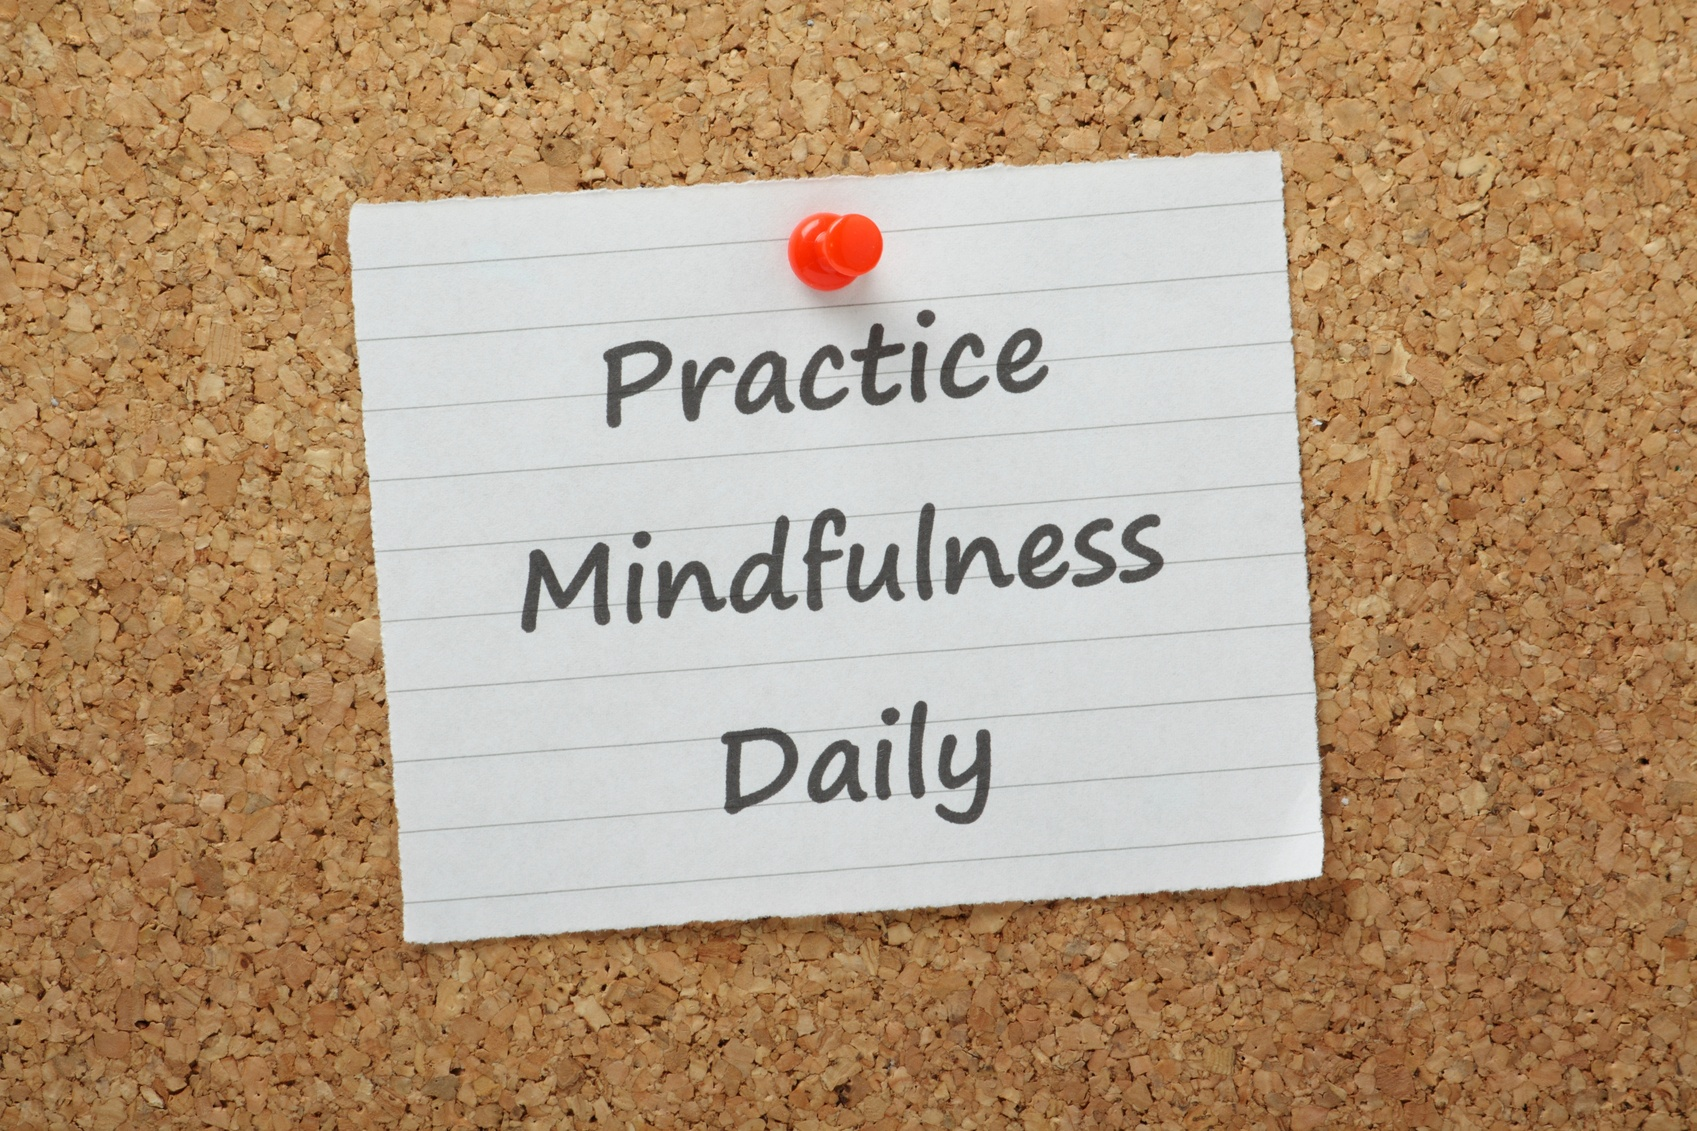 Practice-Mindfulness-Daily-000037220282_Medium.jpg